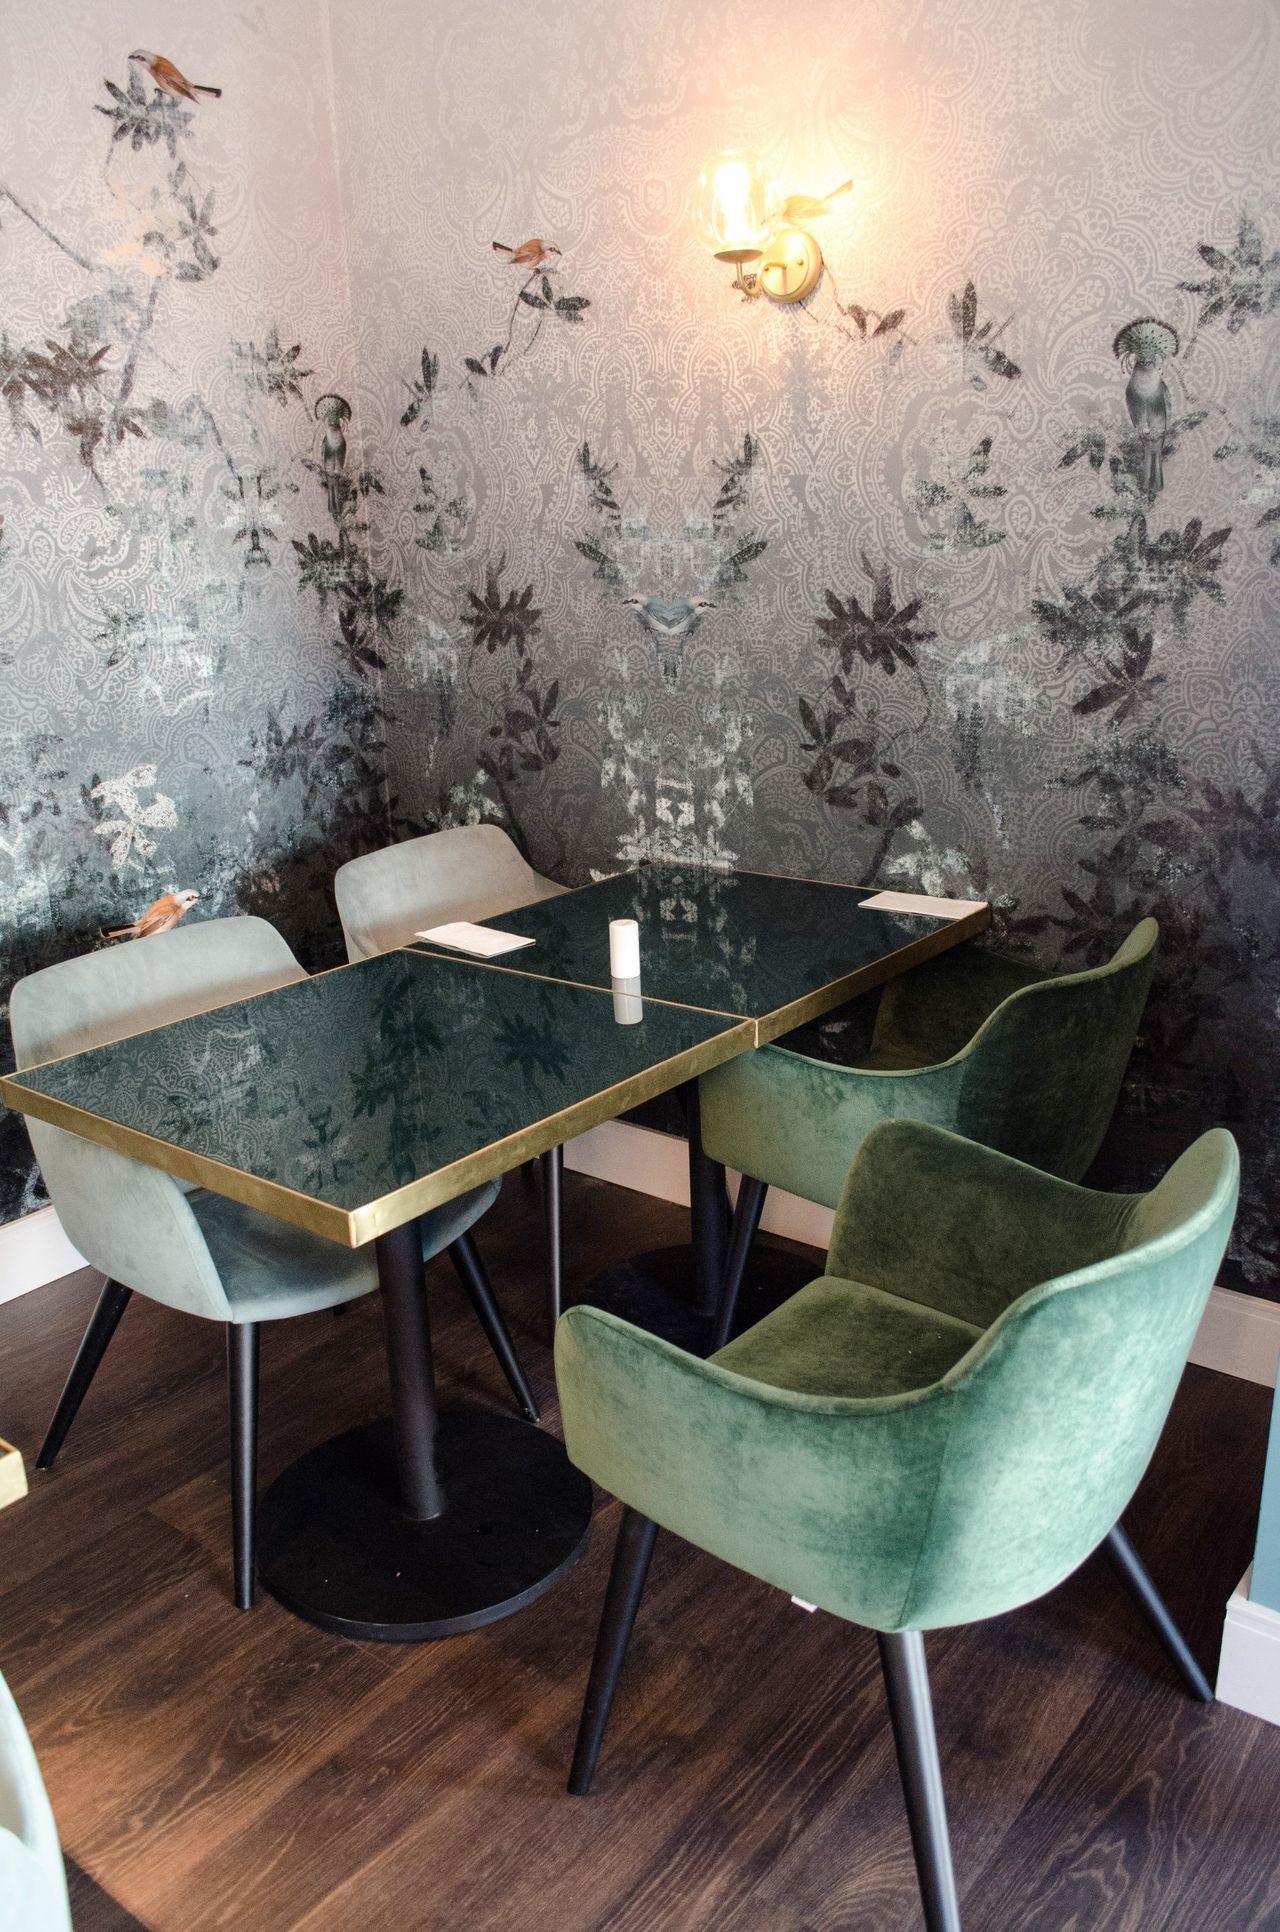 Sala De Jantar Com Papel De Parede Cl Ssico Neutro De Casacor Sp  -> Papel De Parede Para Sala Neutro